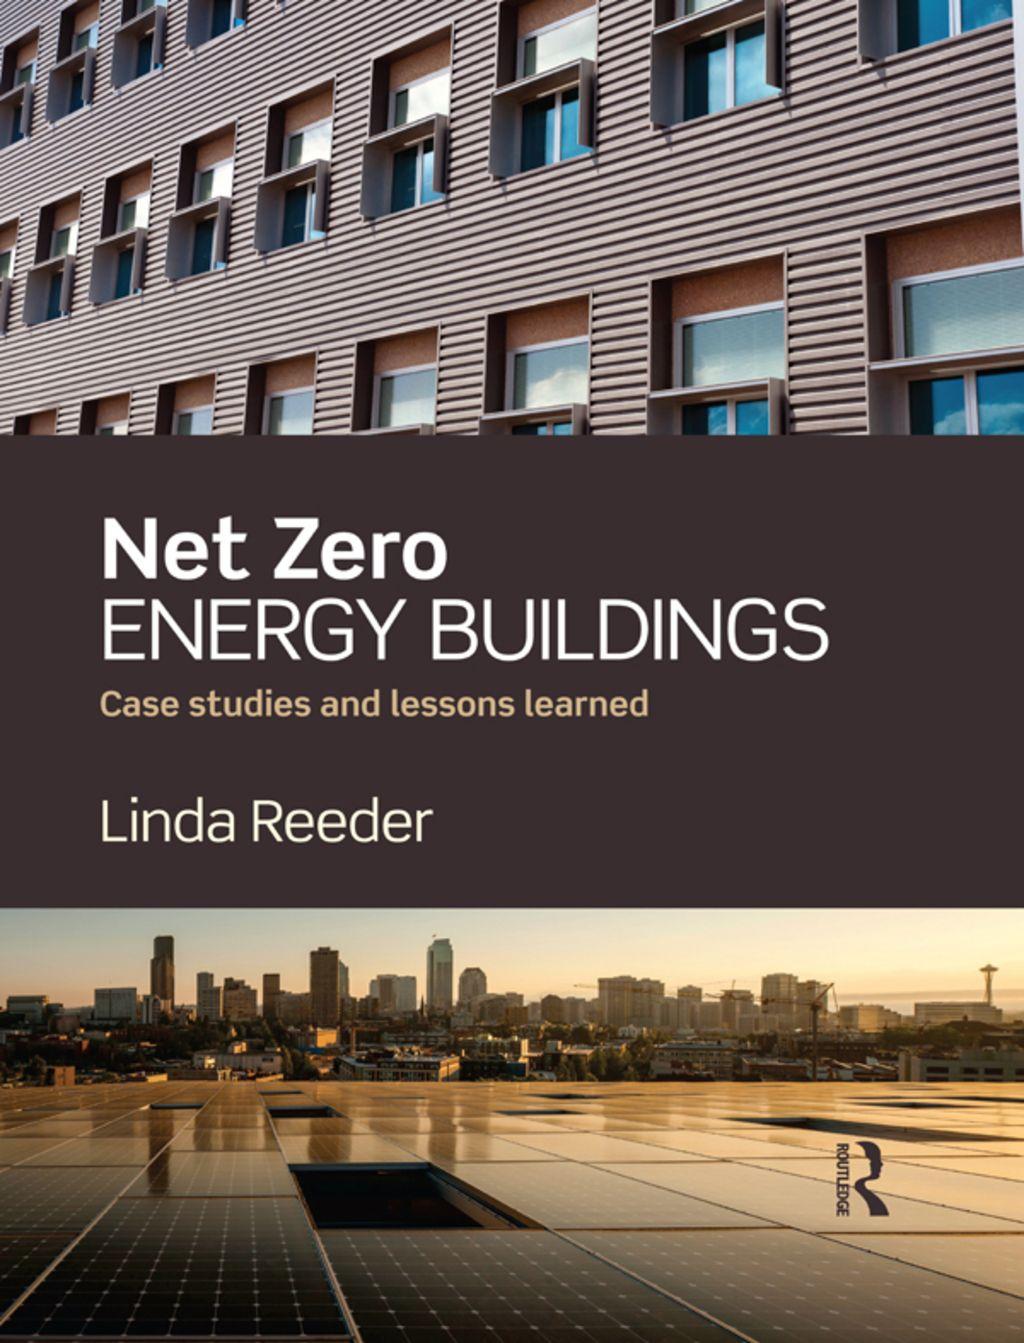 Net Zero Energy Buildings Ebook Rental Zero Energy Building Zero Energy Building